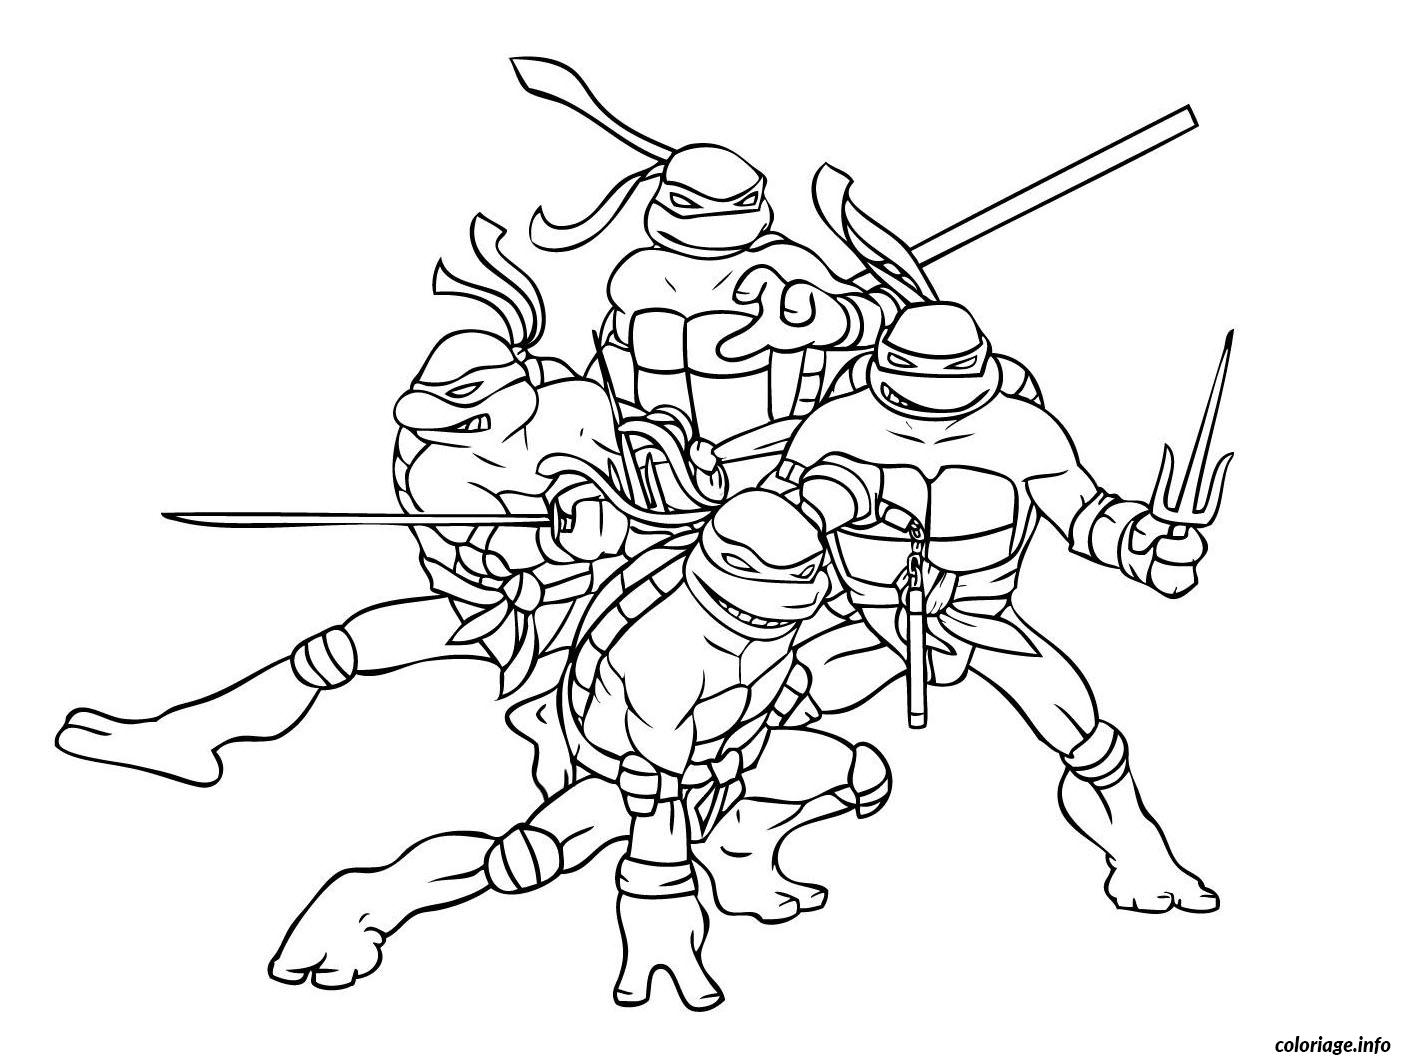 Coloriage tortue ninja 2 - Tortue a colorier ...